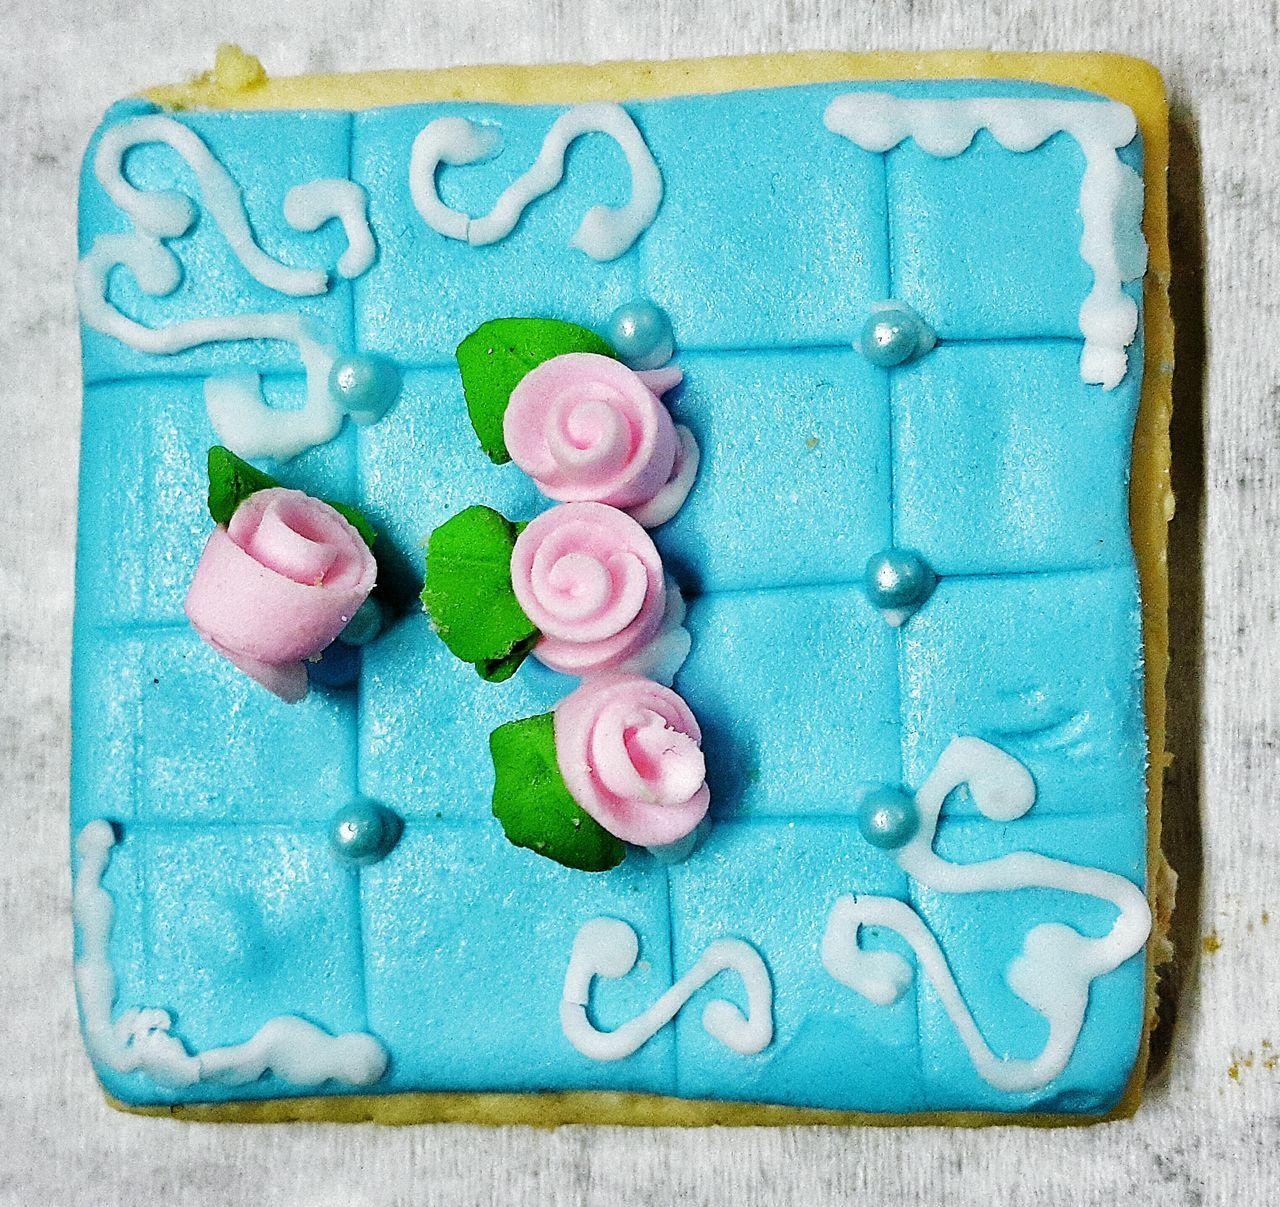 Cake Torta Celeste Cake♥ Small Cake Light Blue Sweet Things Sweet Thing